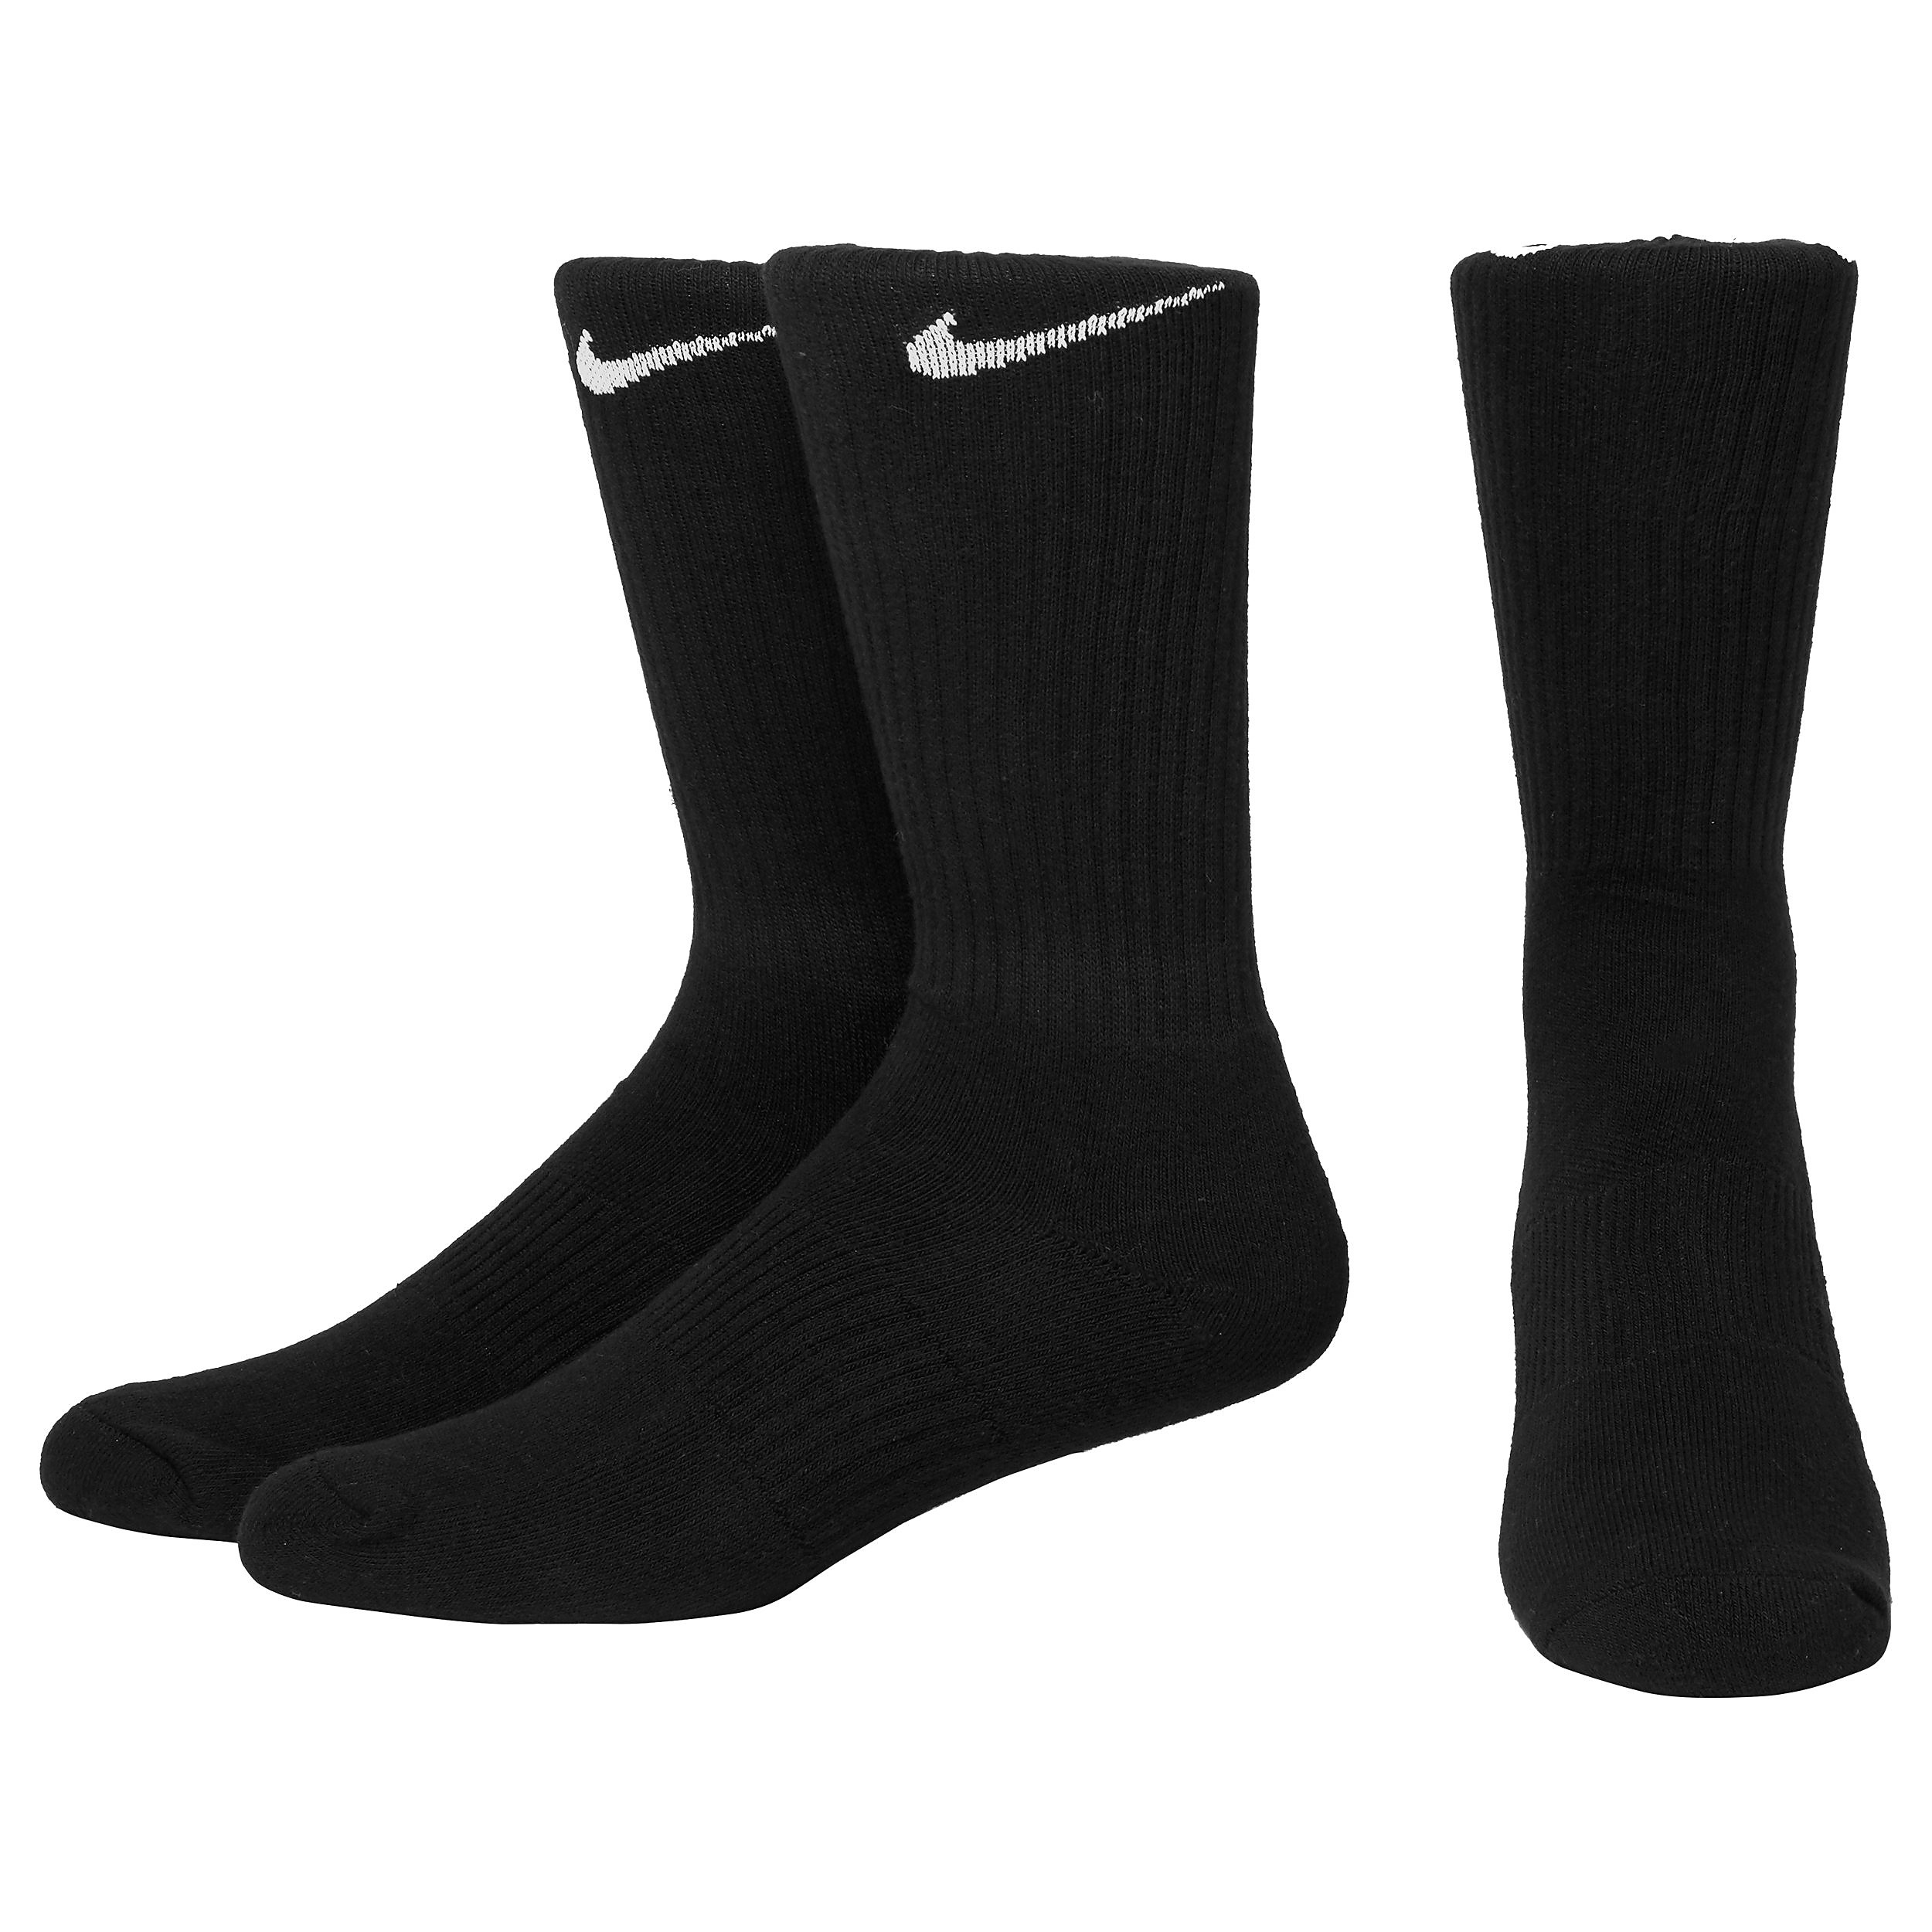 Nike Dri-FIT Cushion Crew Socks (3 Pack)